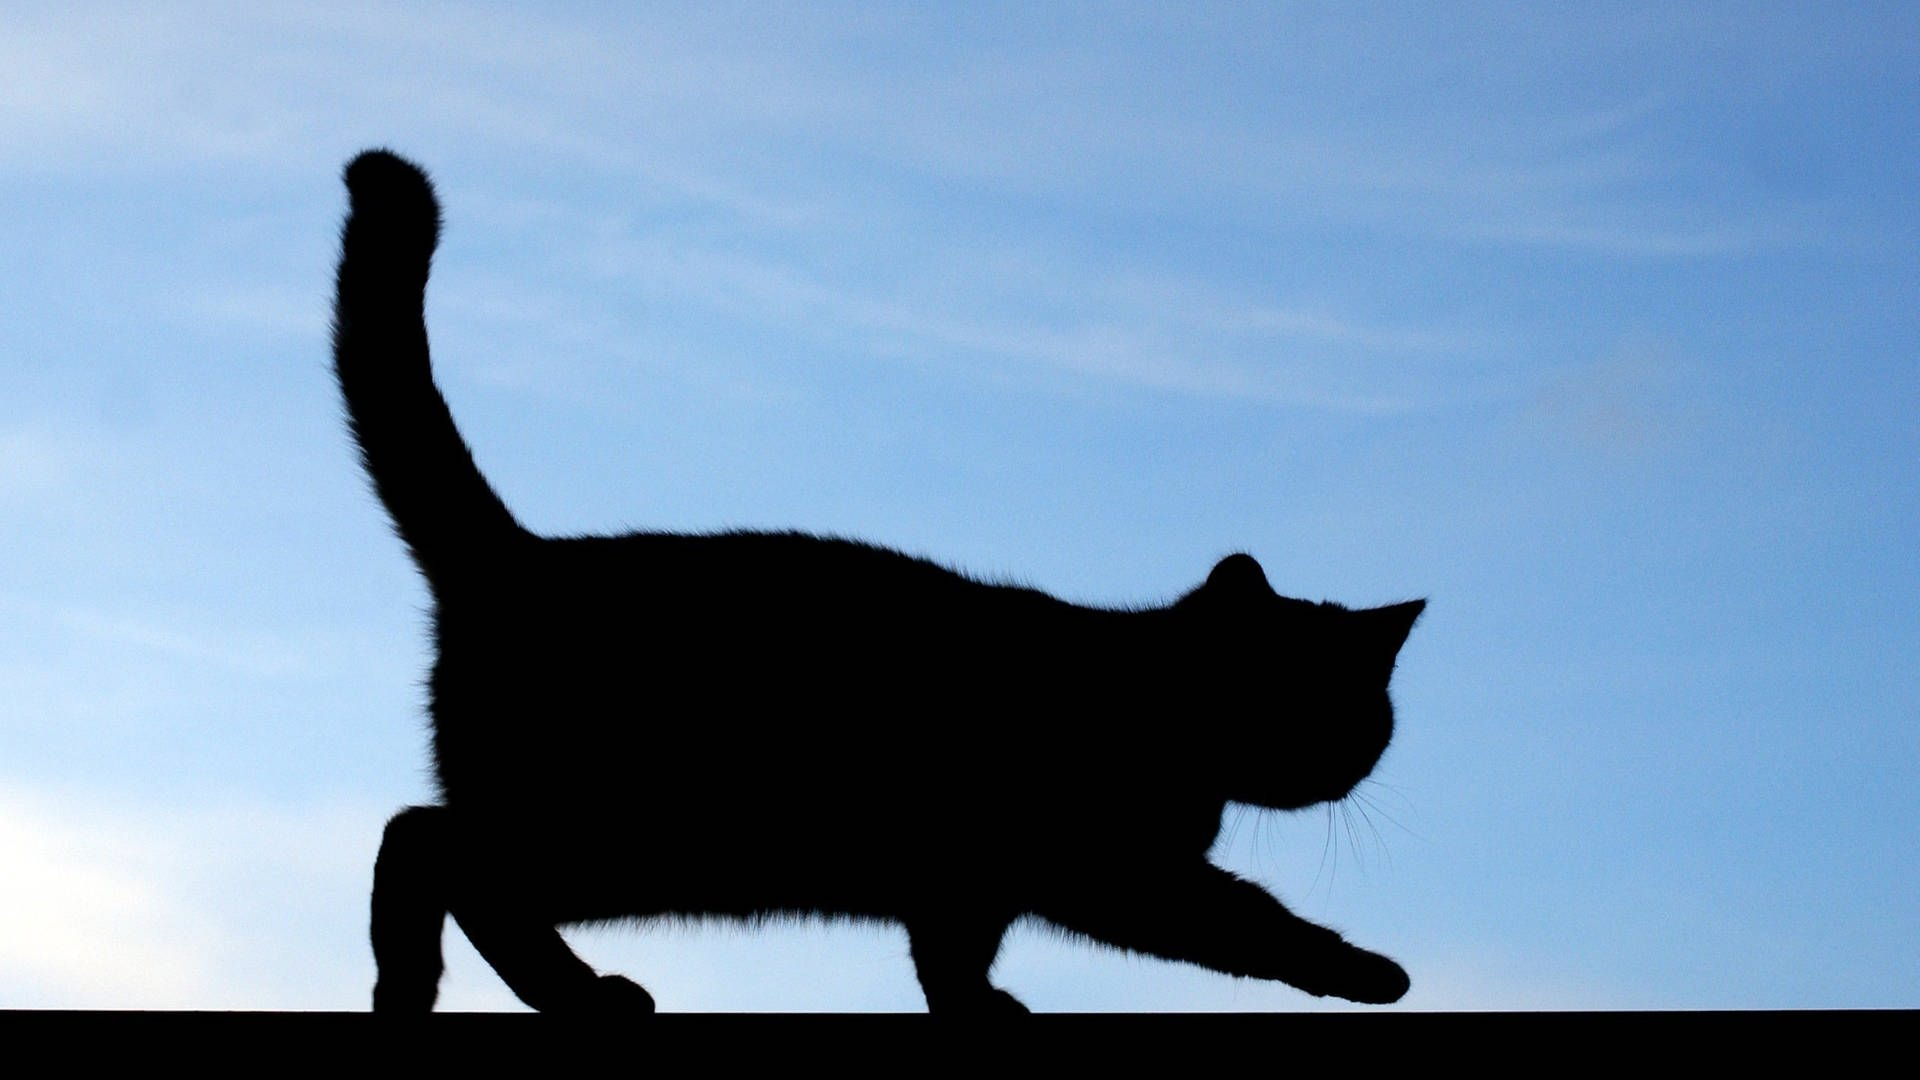 Katze mit Säure übergossen